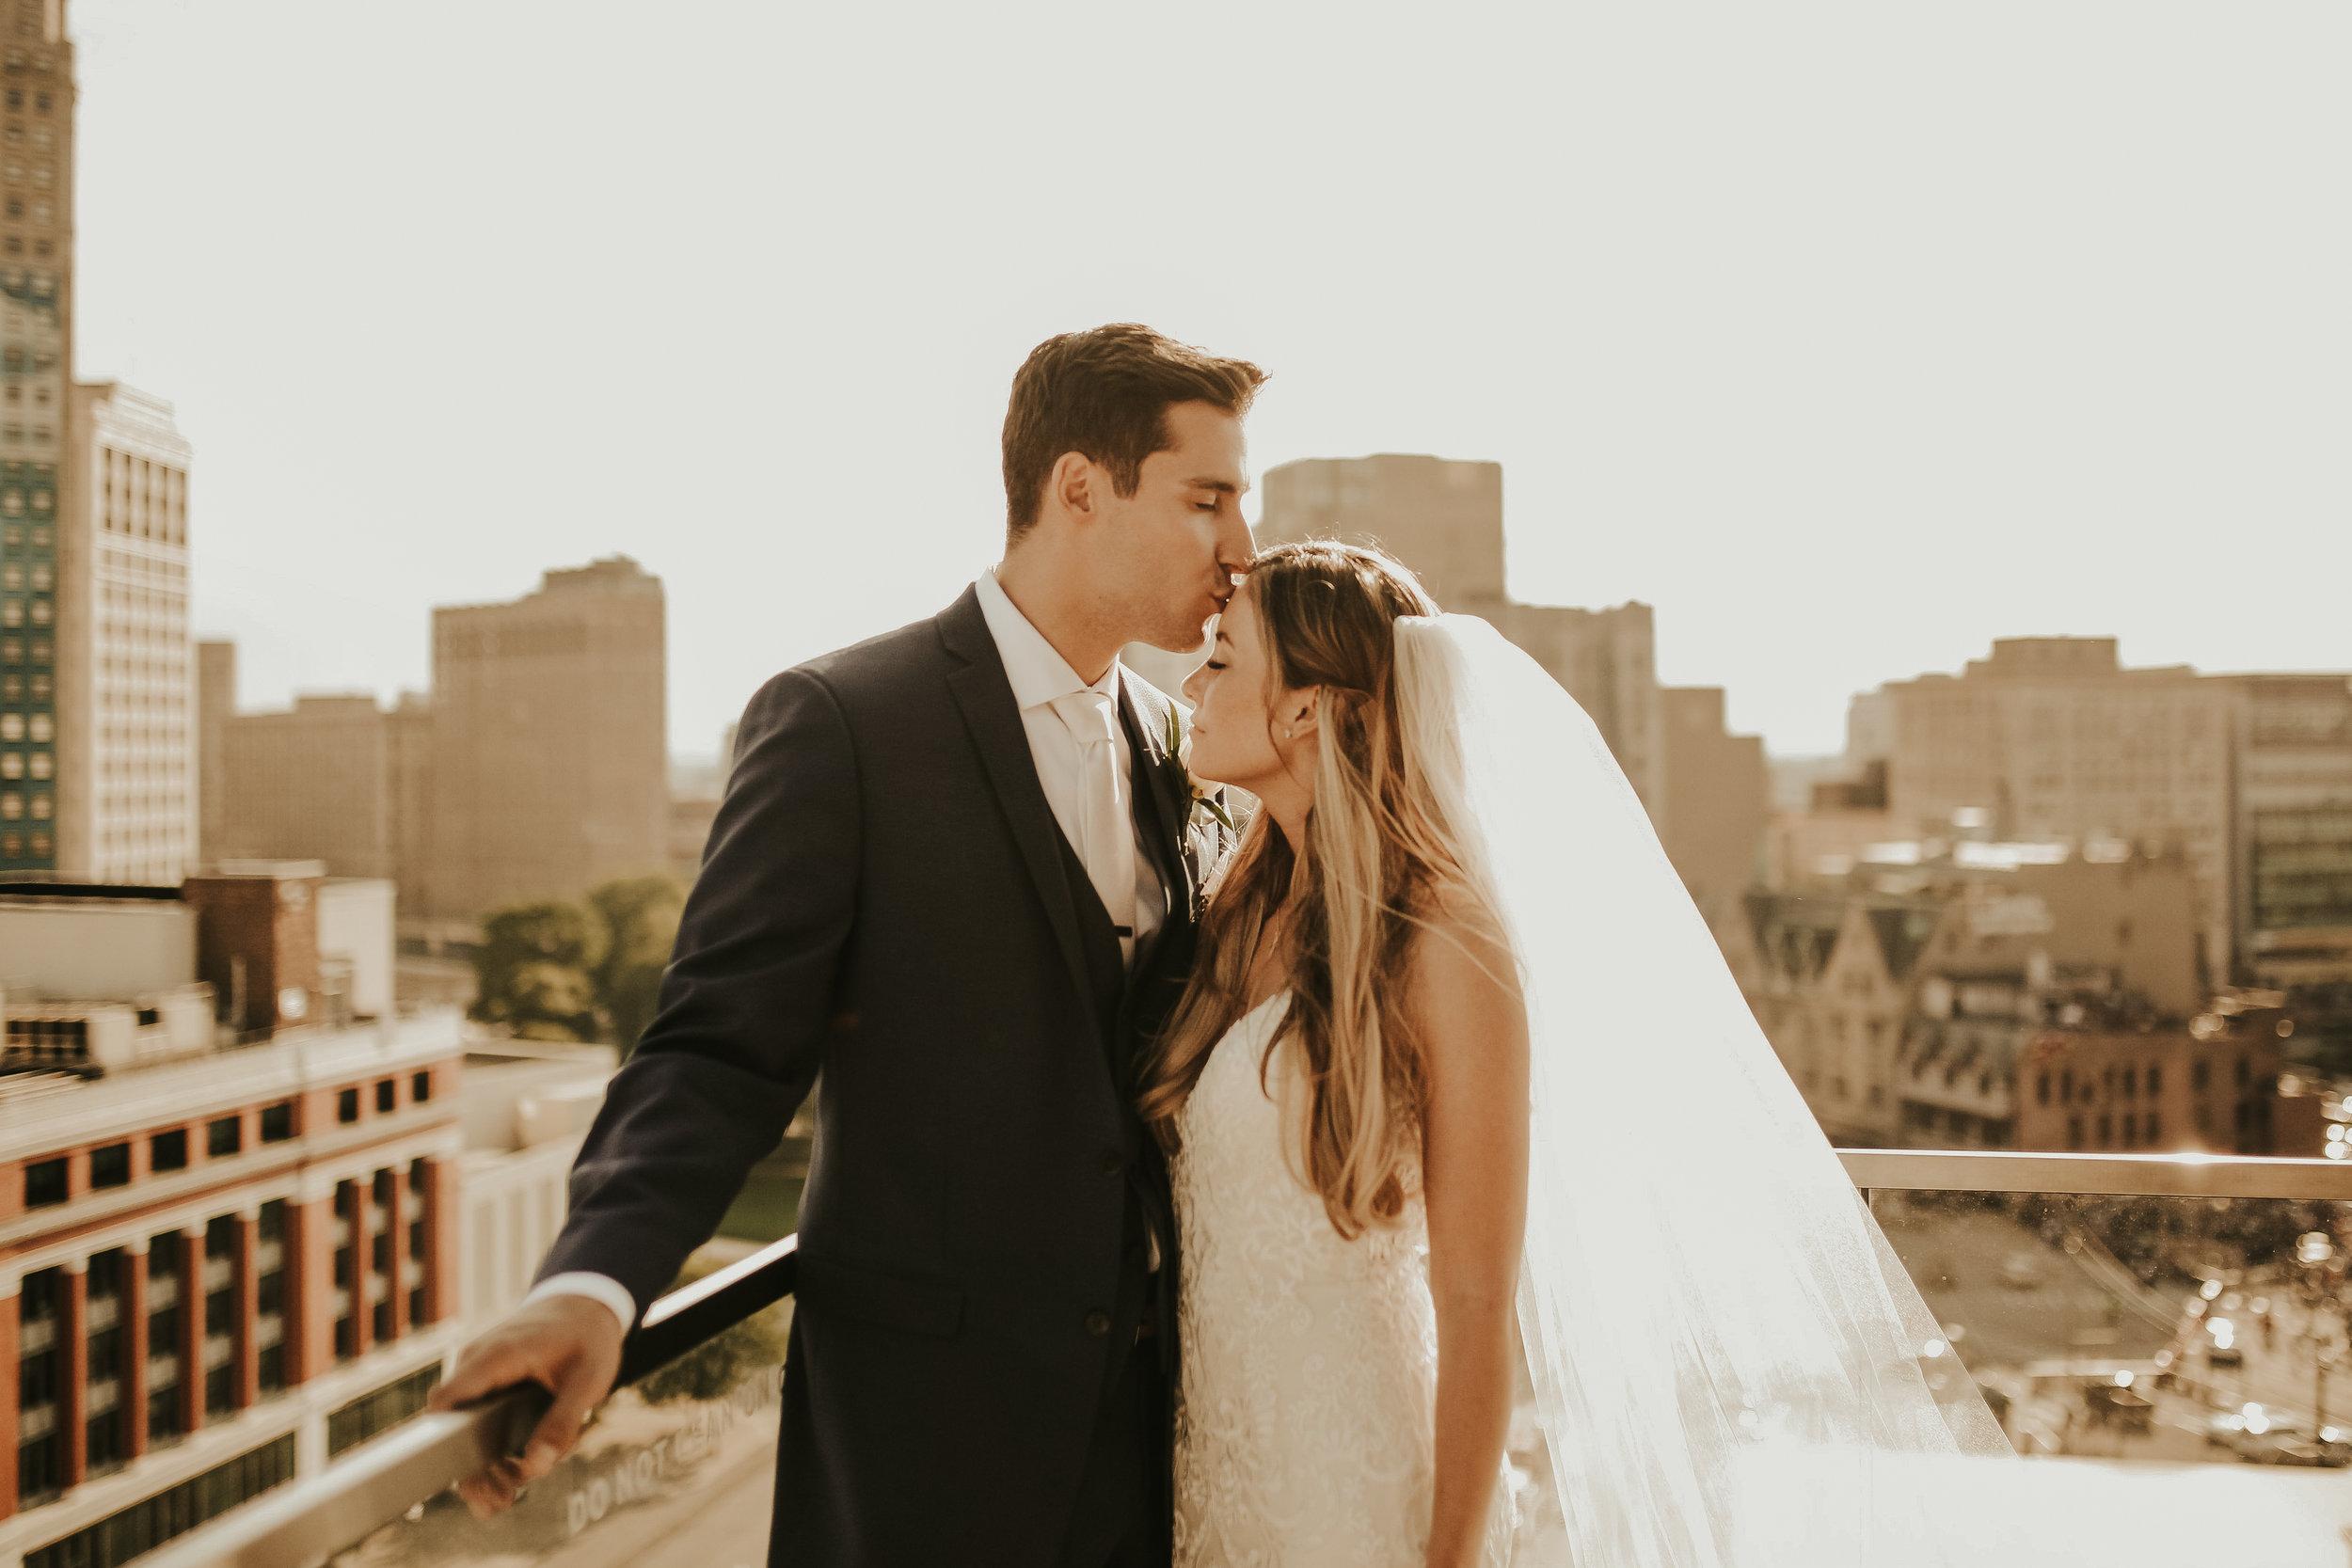 Mr+MrsSzandzik_Wedding_599.jpg